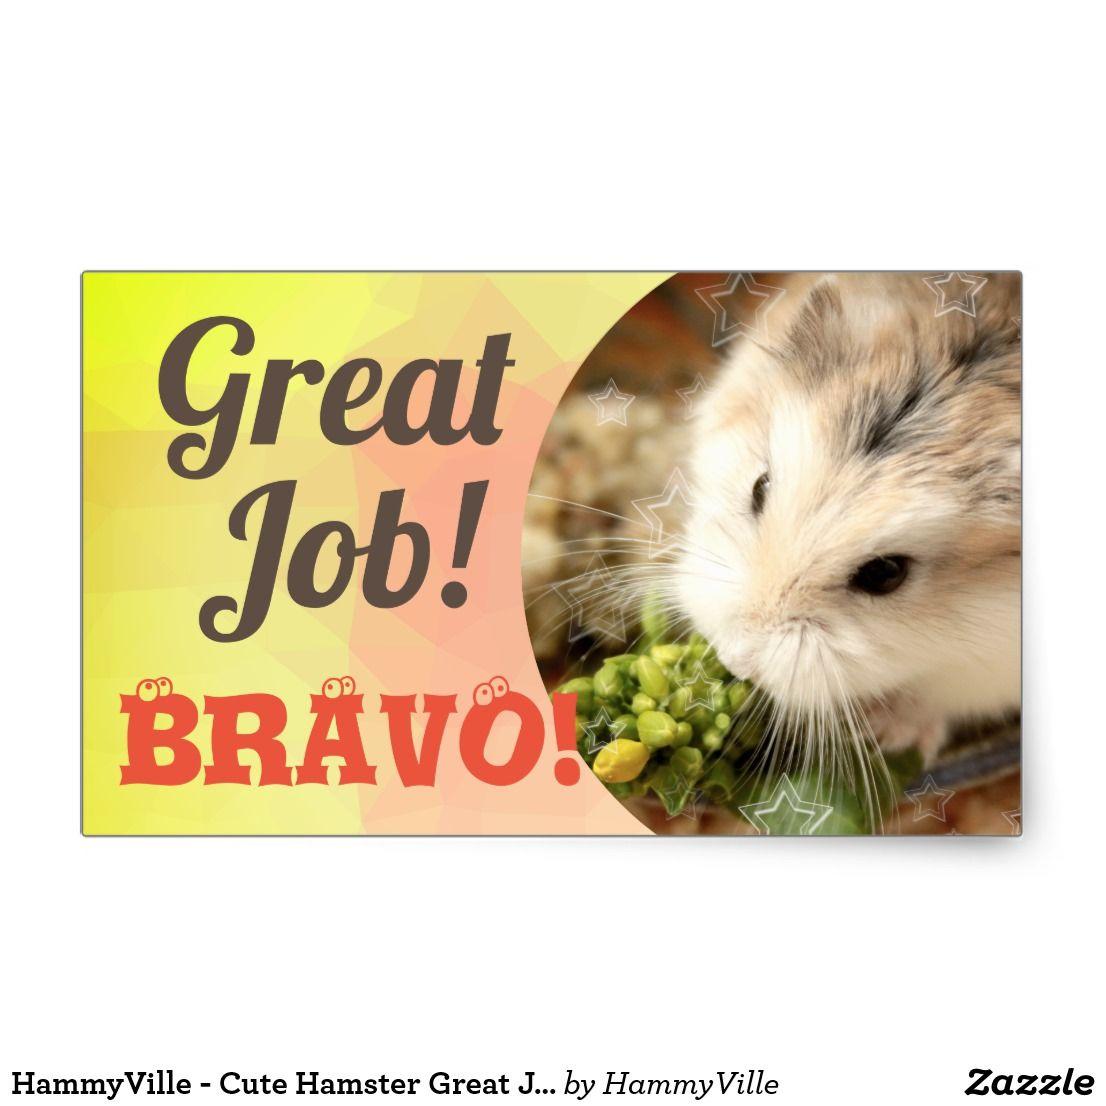 Hammyville Cute Hamster Great Job Bravo Rectangular Sticker Zazzle Com In 2020 Cute Hamsters Hamster Colorful Backgrounds